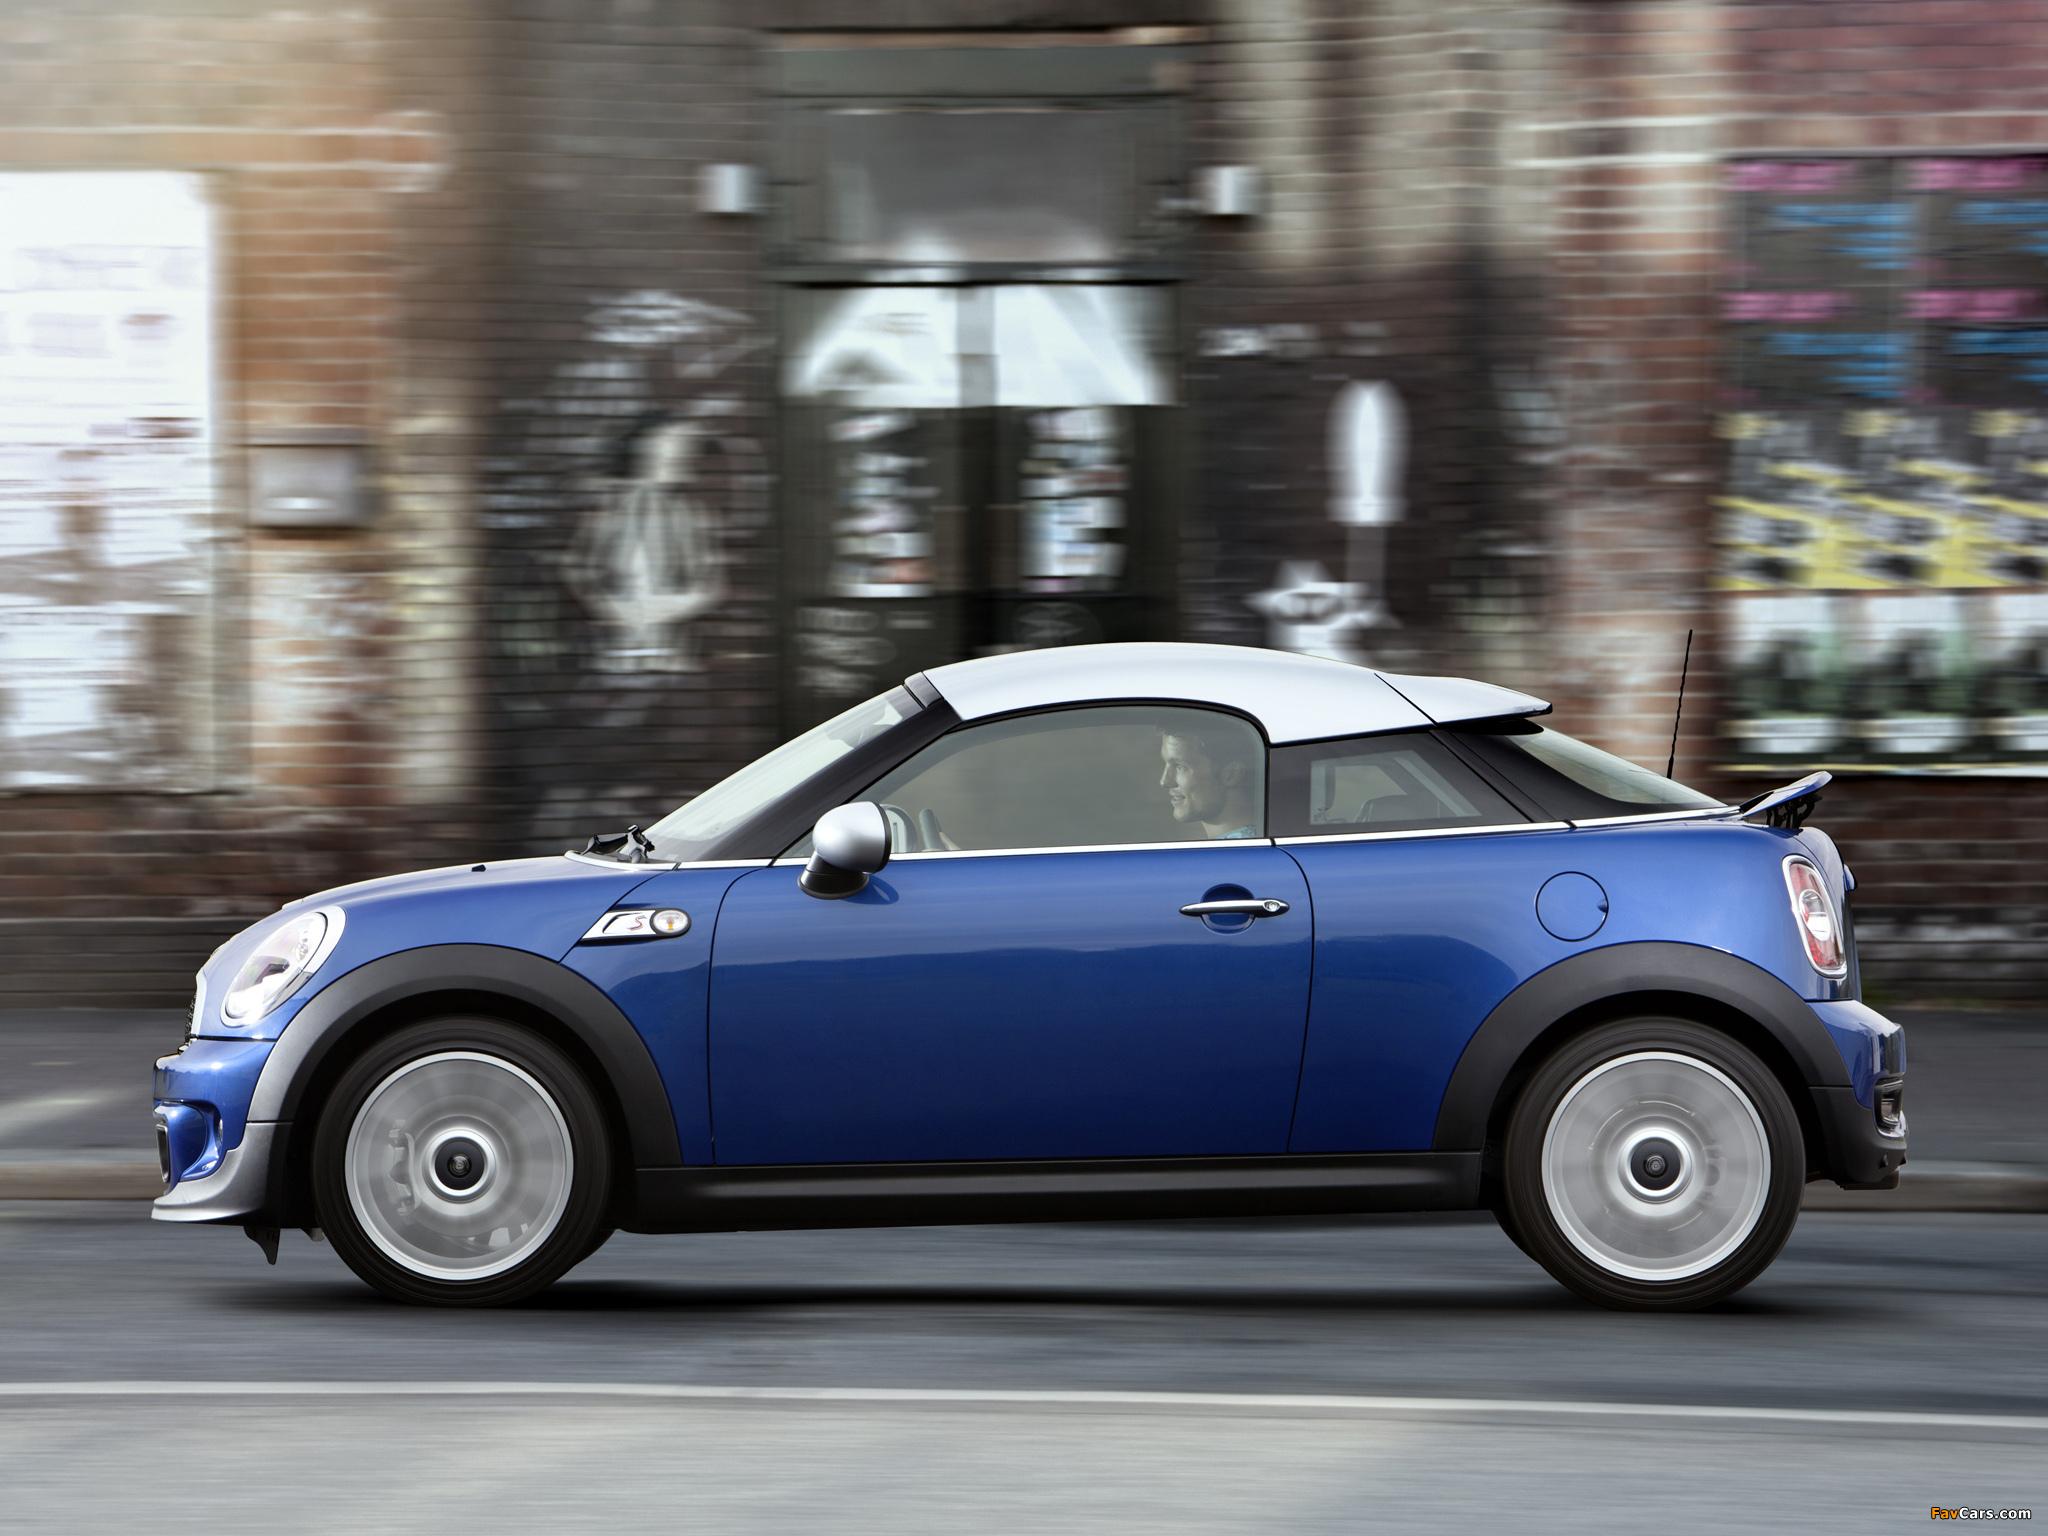 MINI Cooper S Coupe (R58) 2011 pictures (2048 x 1536)